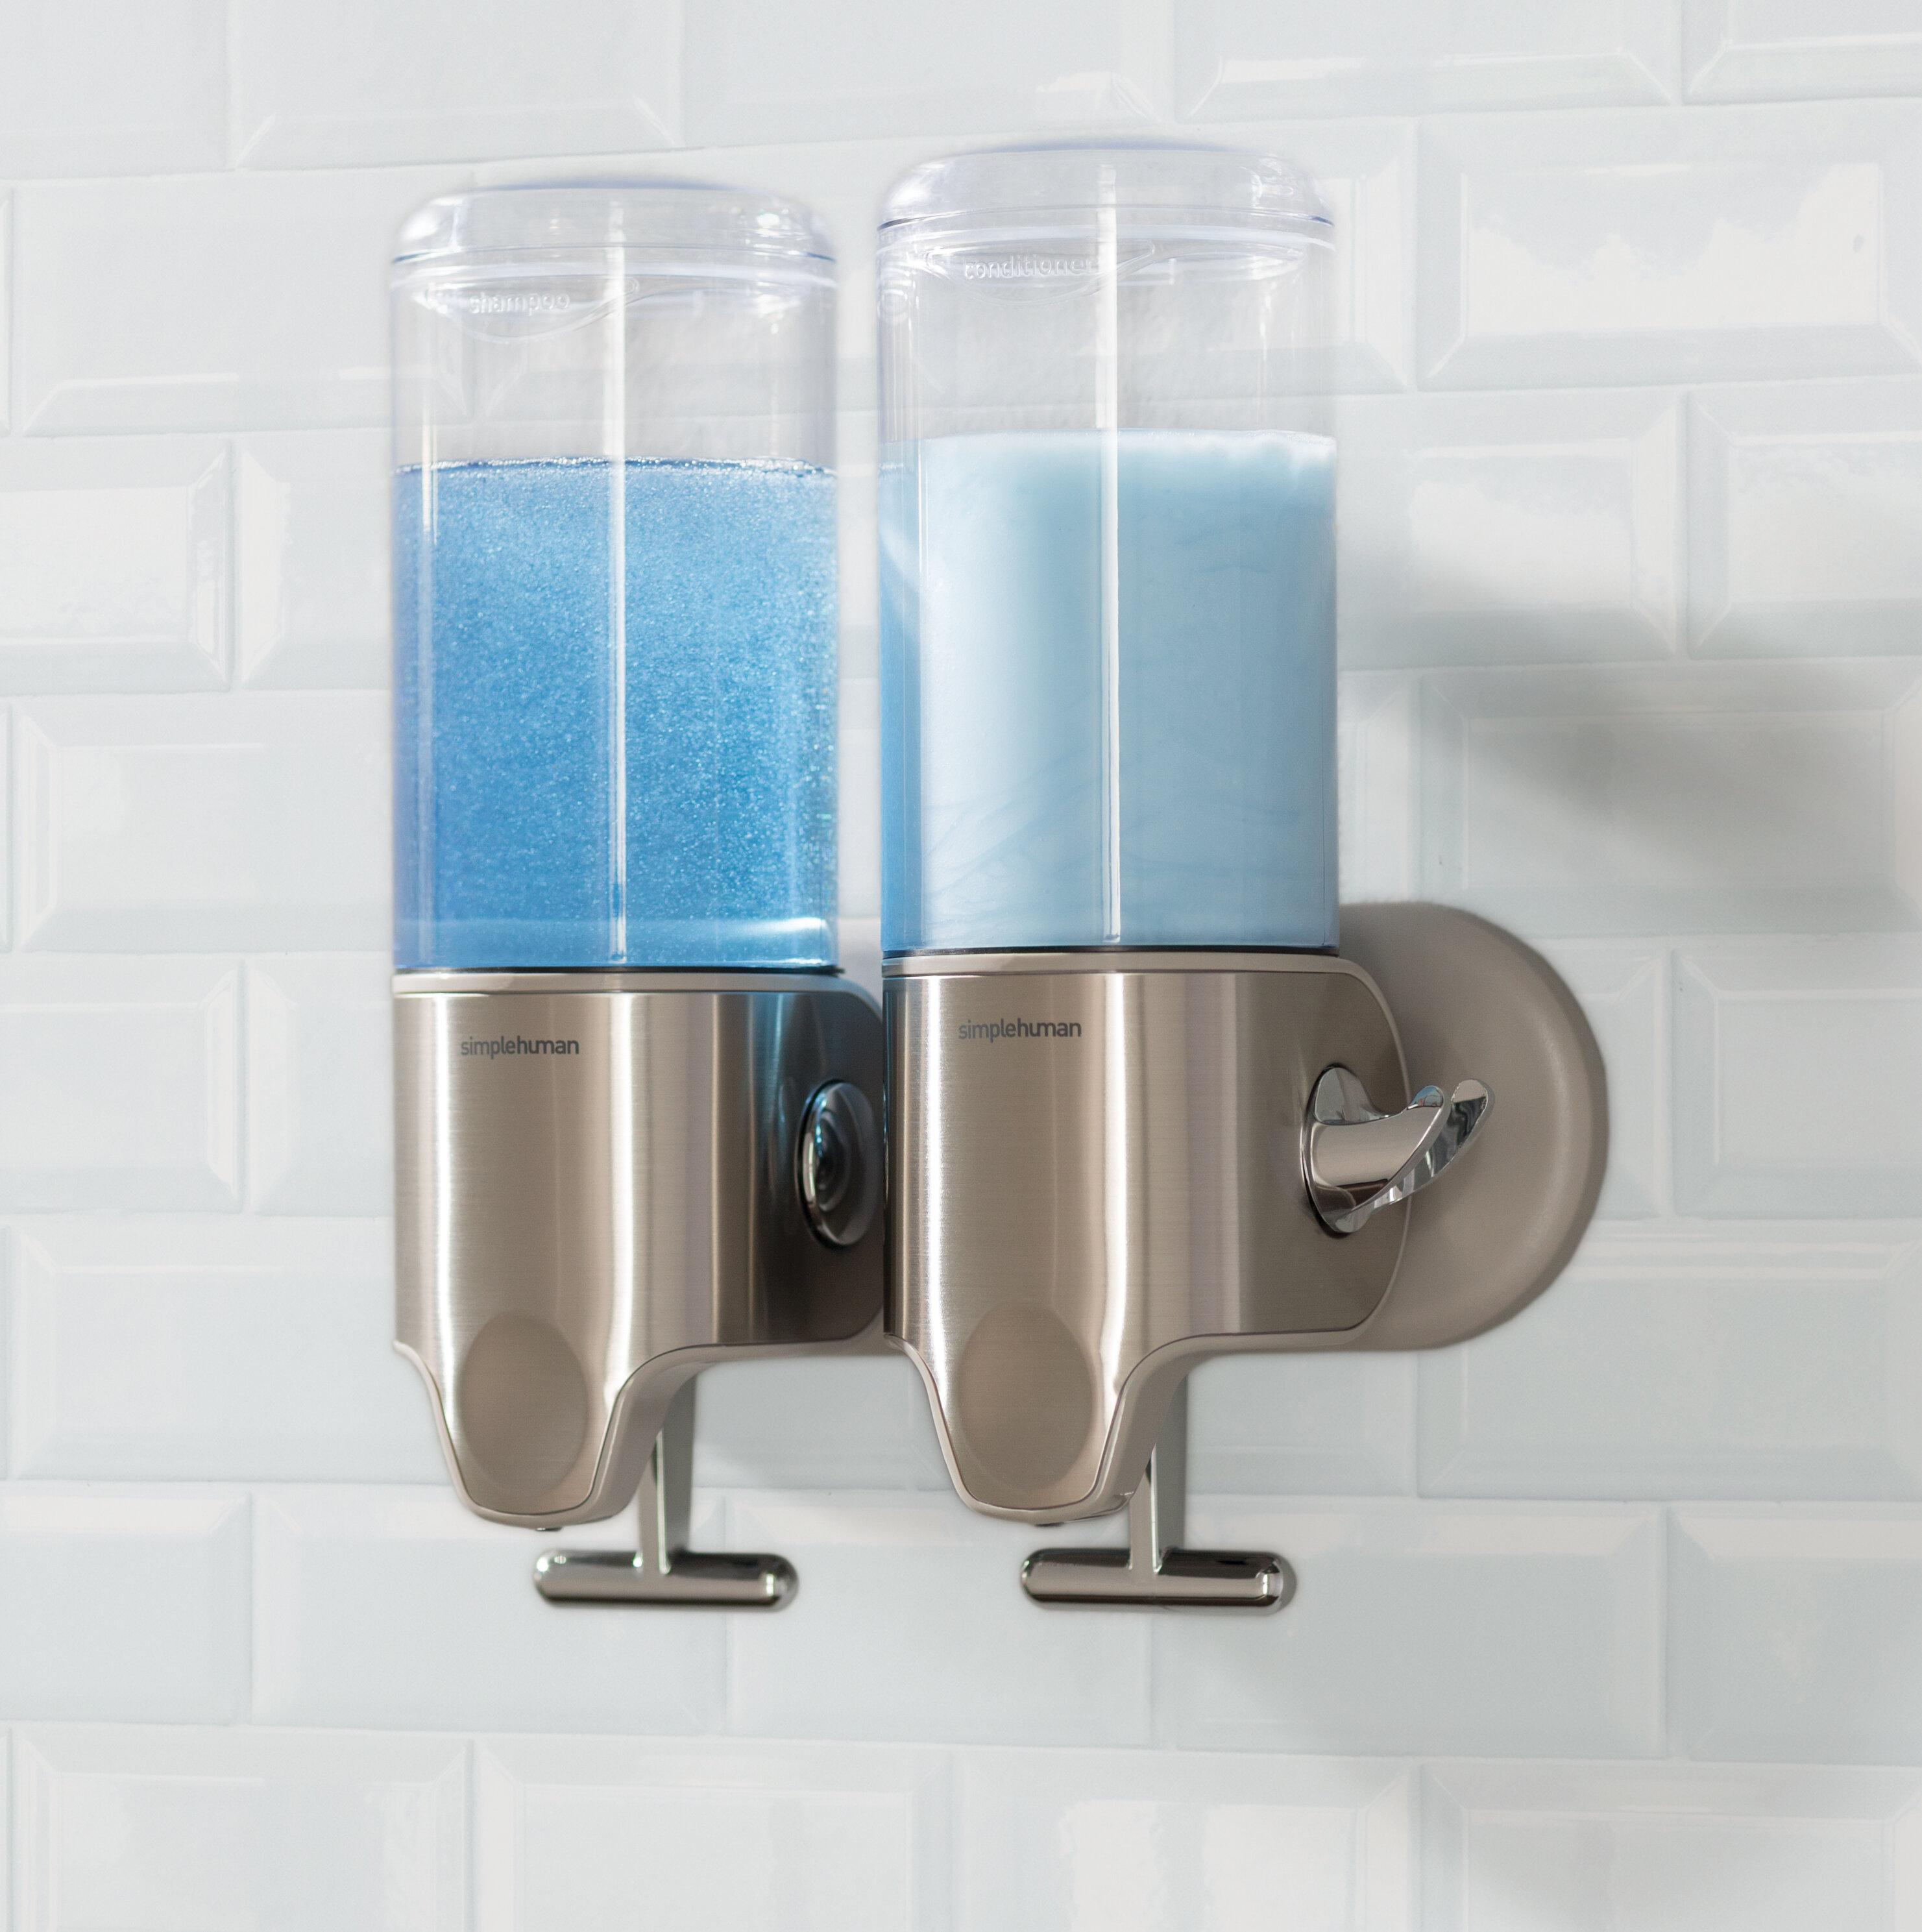 Simplehuman Twin Wall Mount Soap Pumps 15 Fl Oz Each Stainless Steel Reviews Wayfair